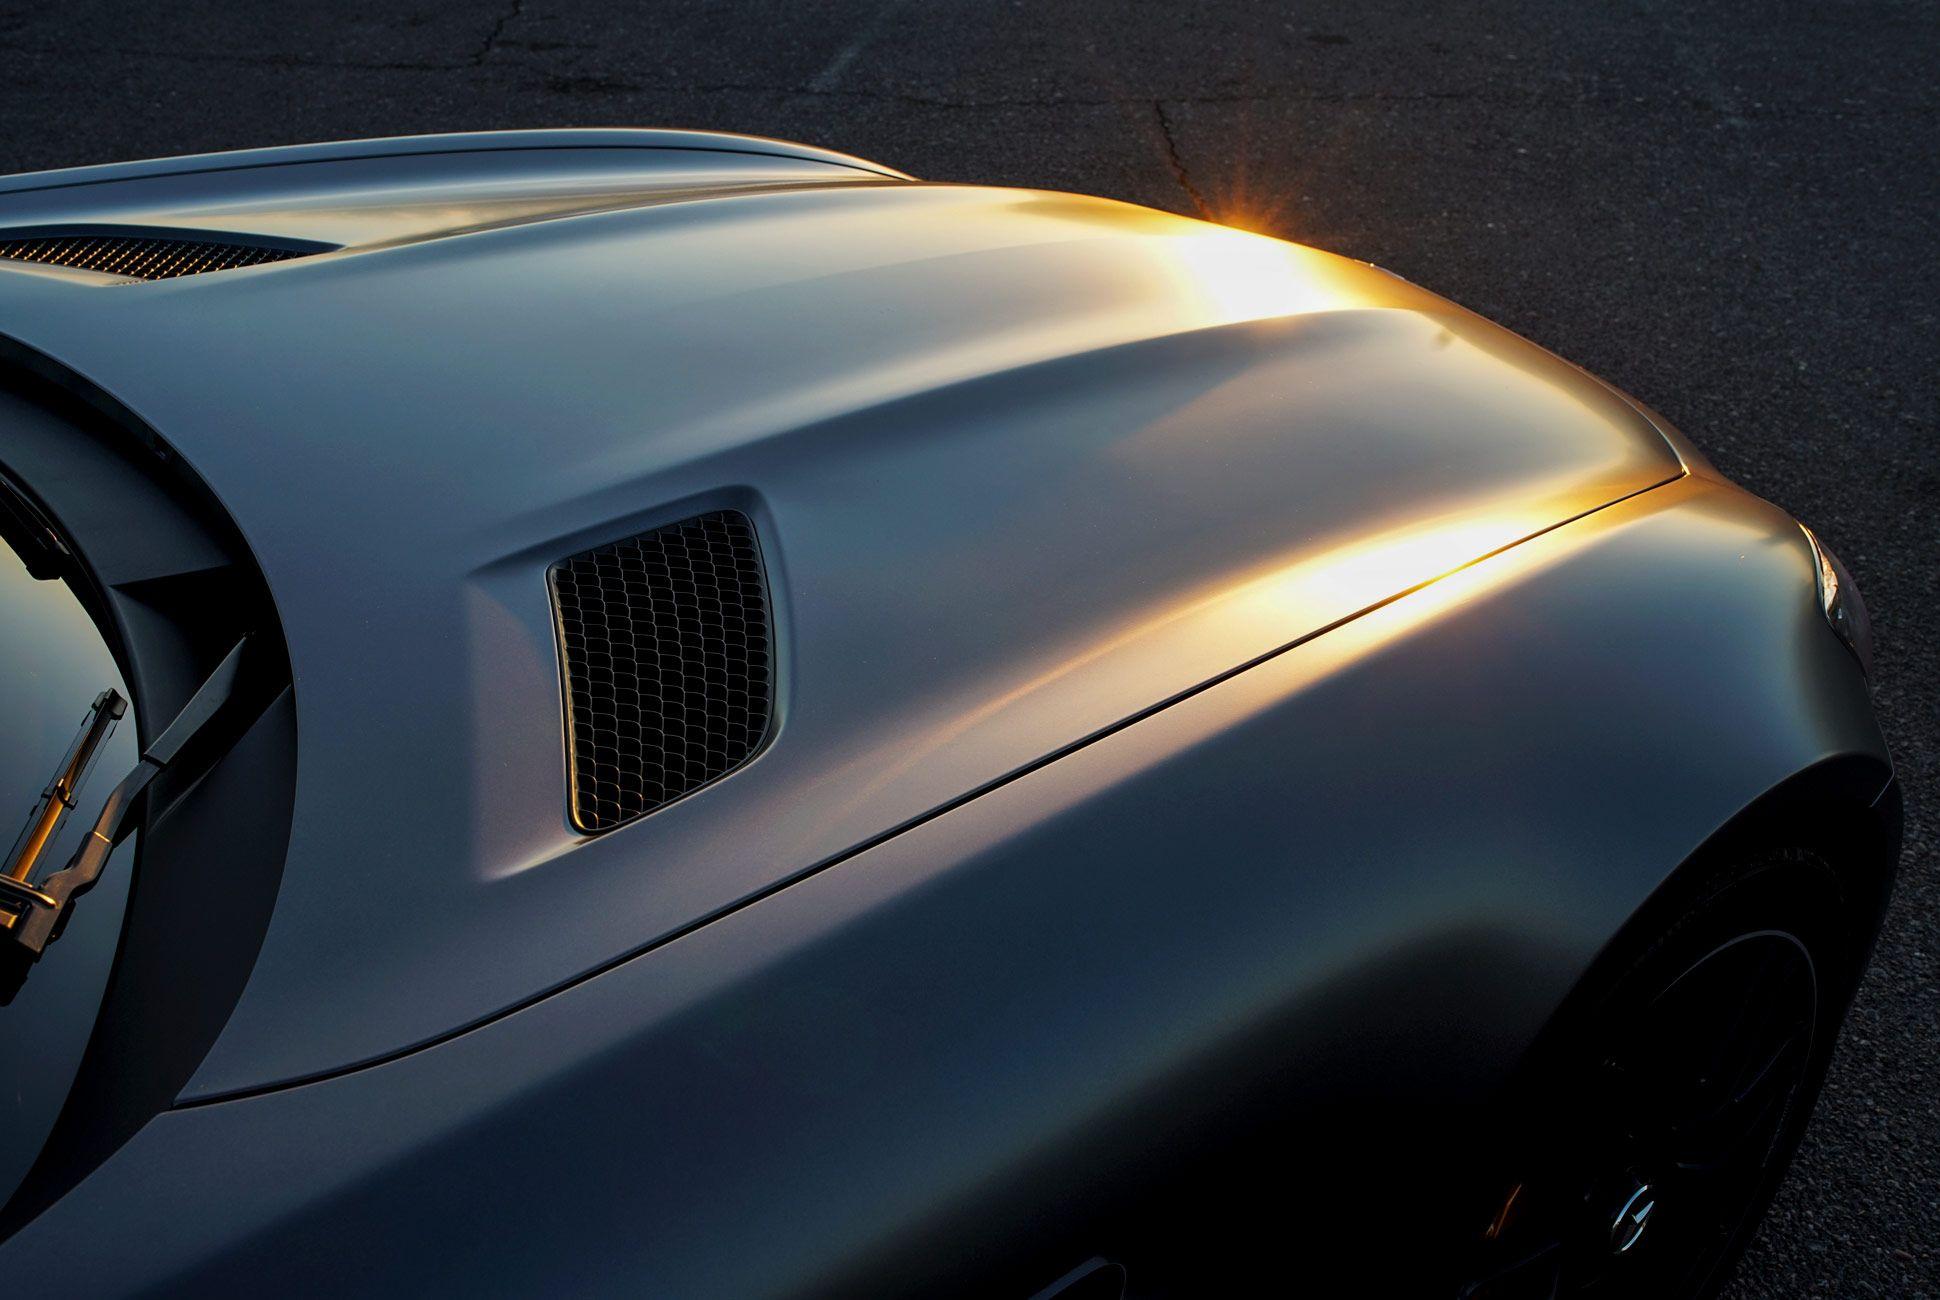 Mercedes-Benz-AMG-GT-C-Gear-Patrol-Ambiance-Slide-3